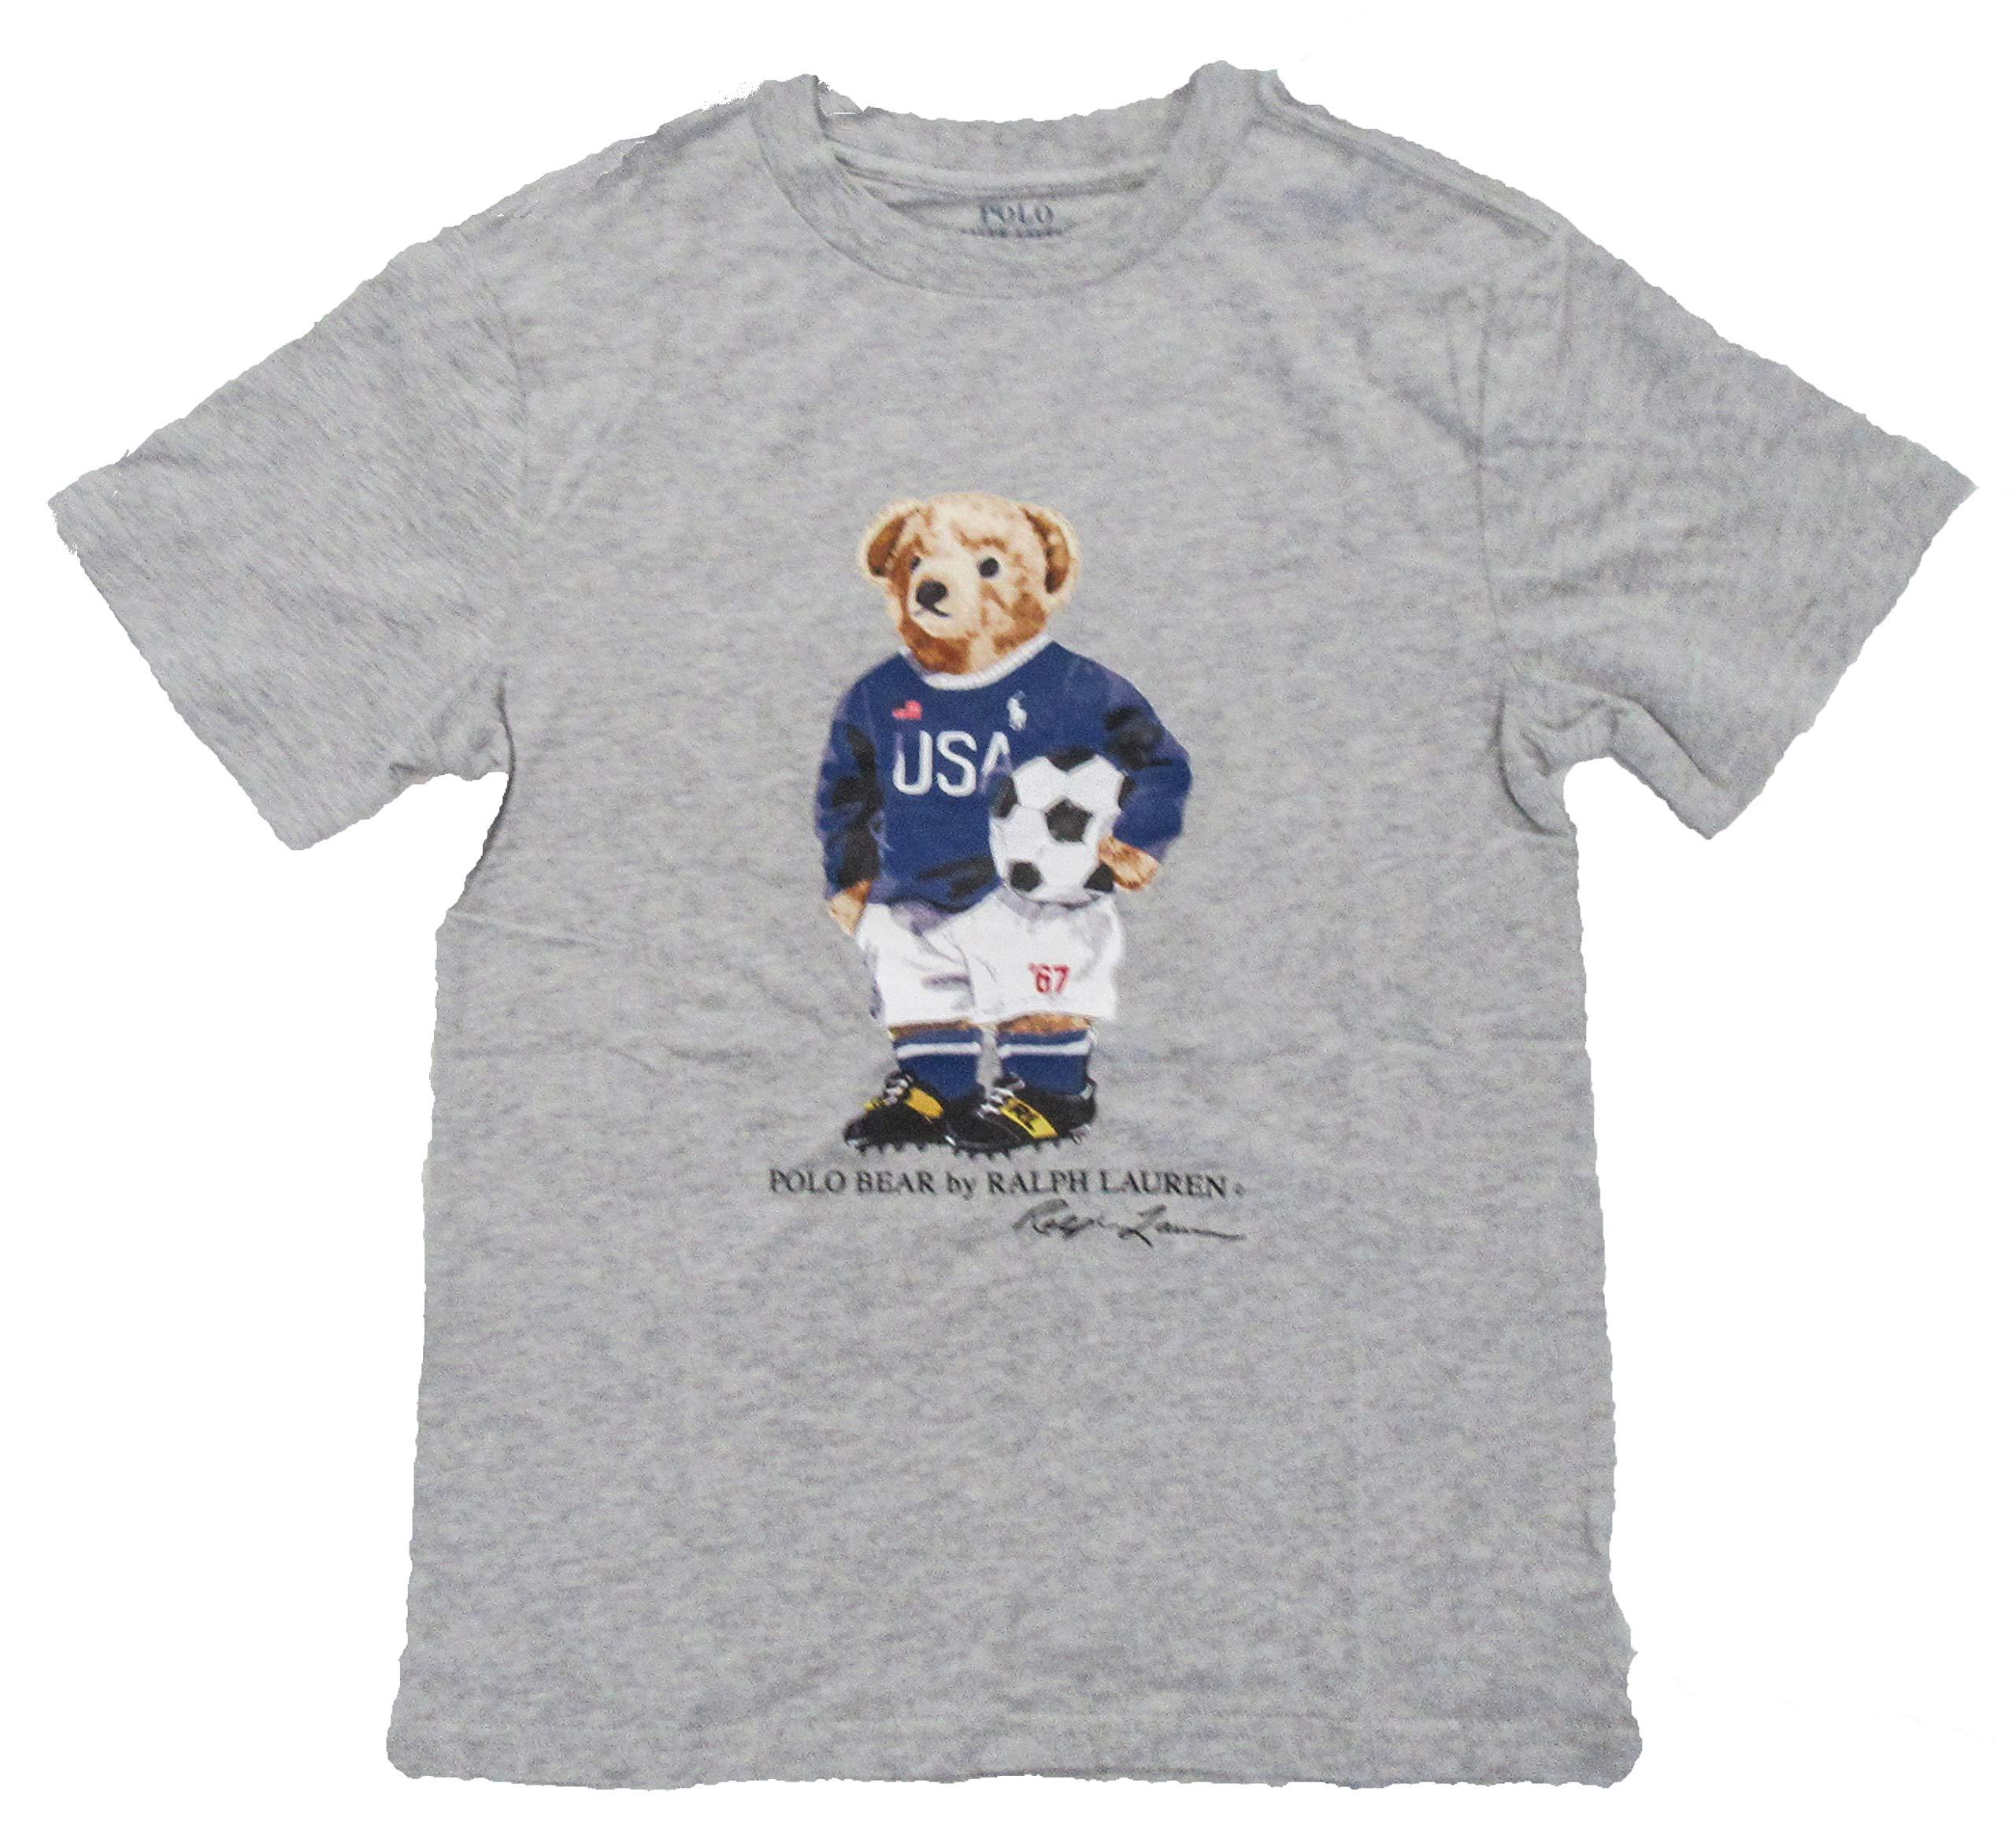 148e6209 Galleon - Polo Ralph Lauren Kid's Polo Bear Short Sleeve ...